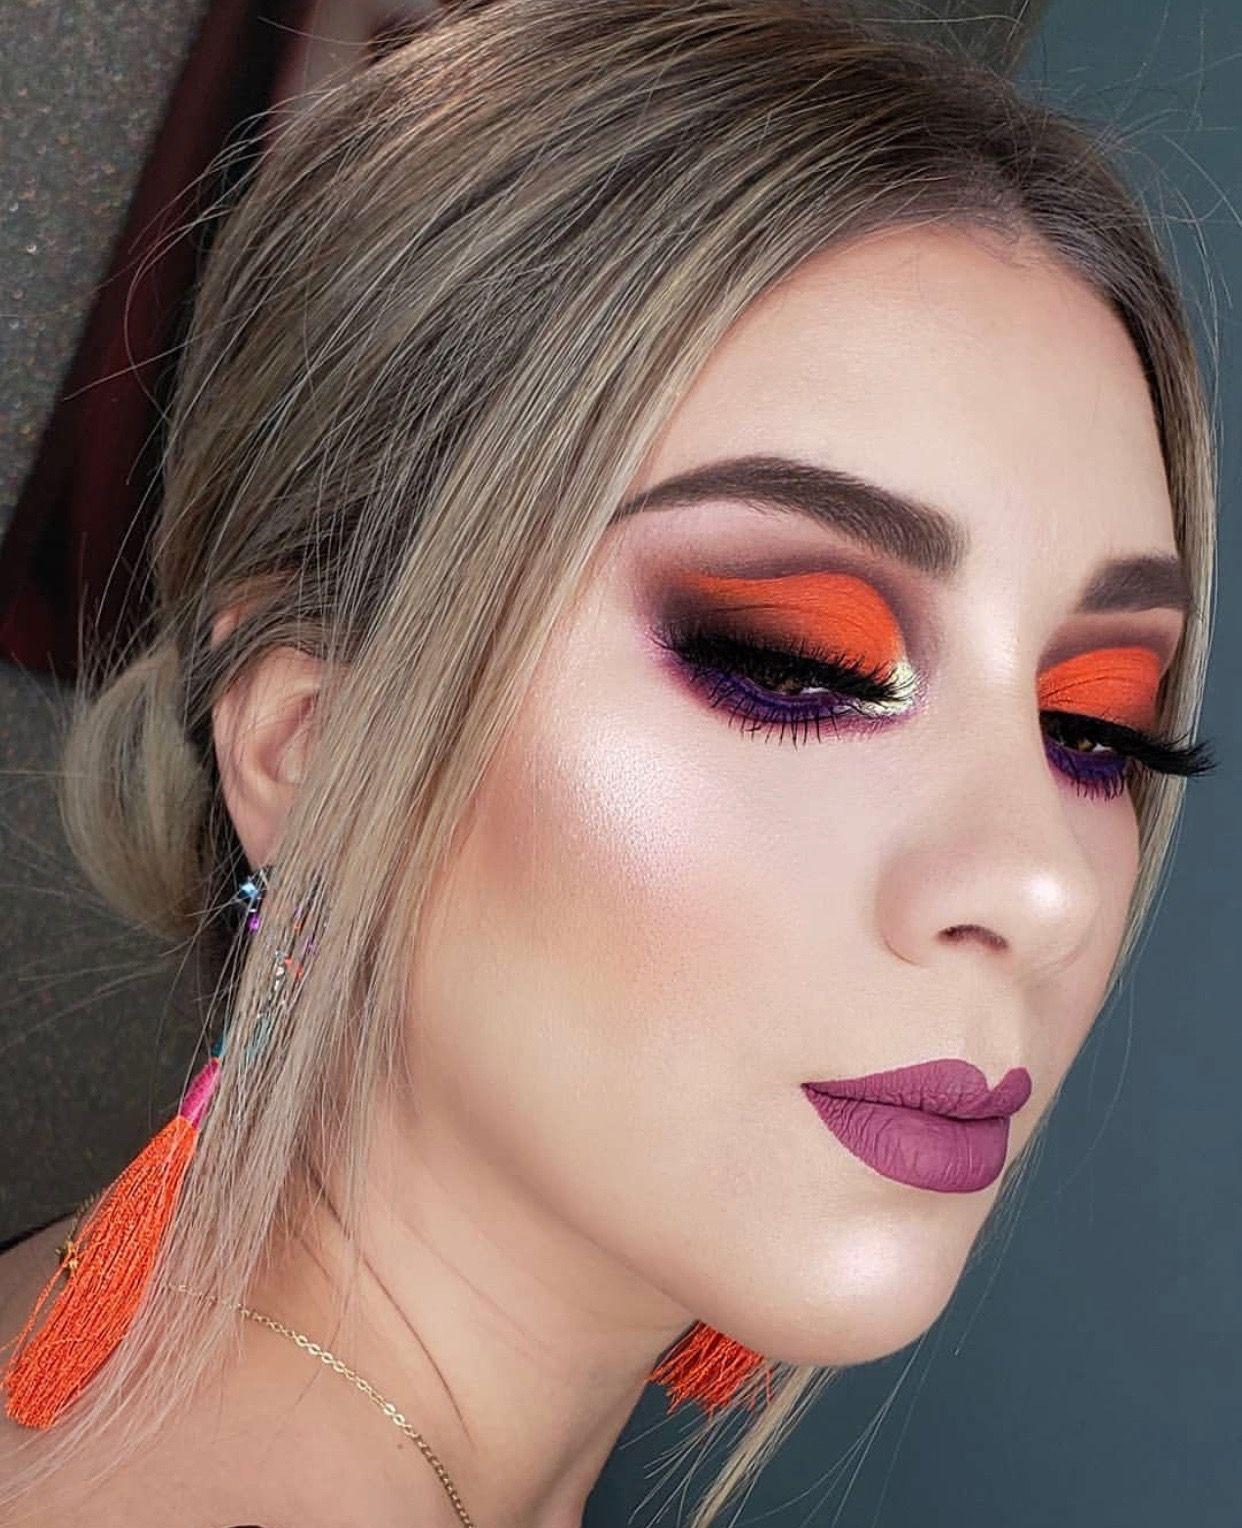 Pin de Melena Crvts en Beauty tips Maquillaje de ojos